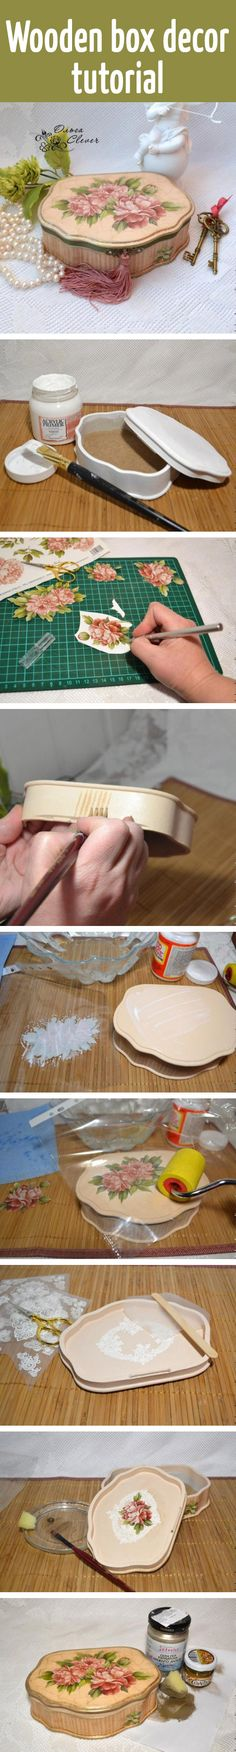 Wooden box decor tutorial